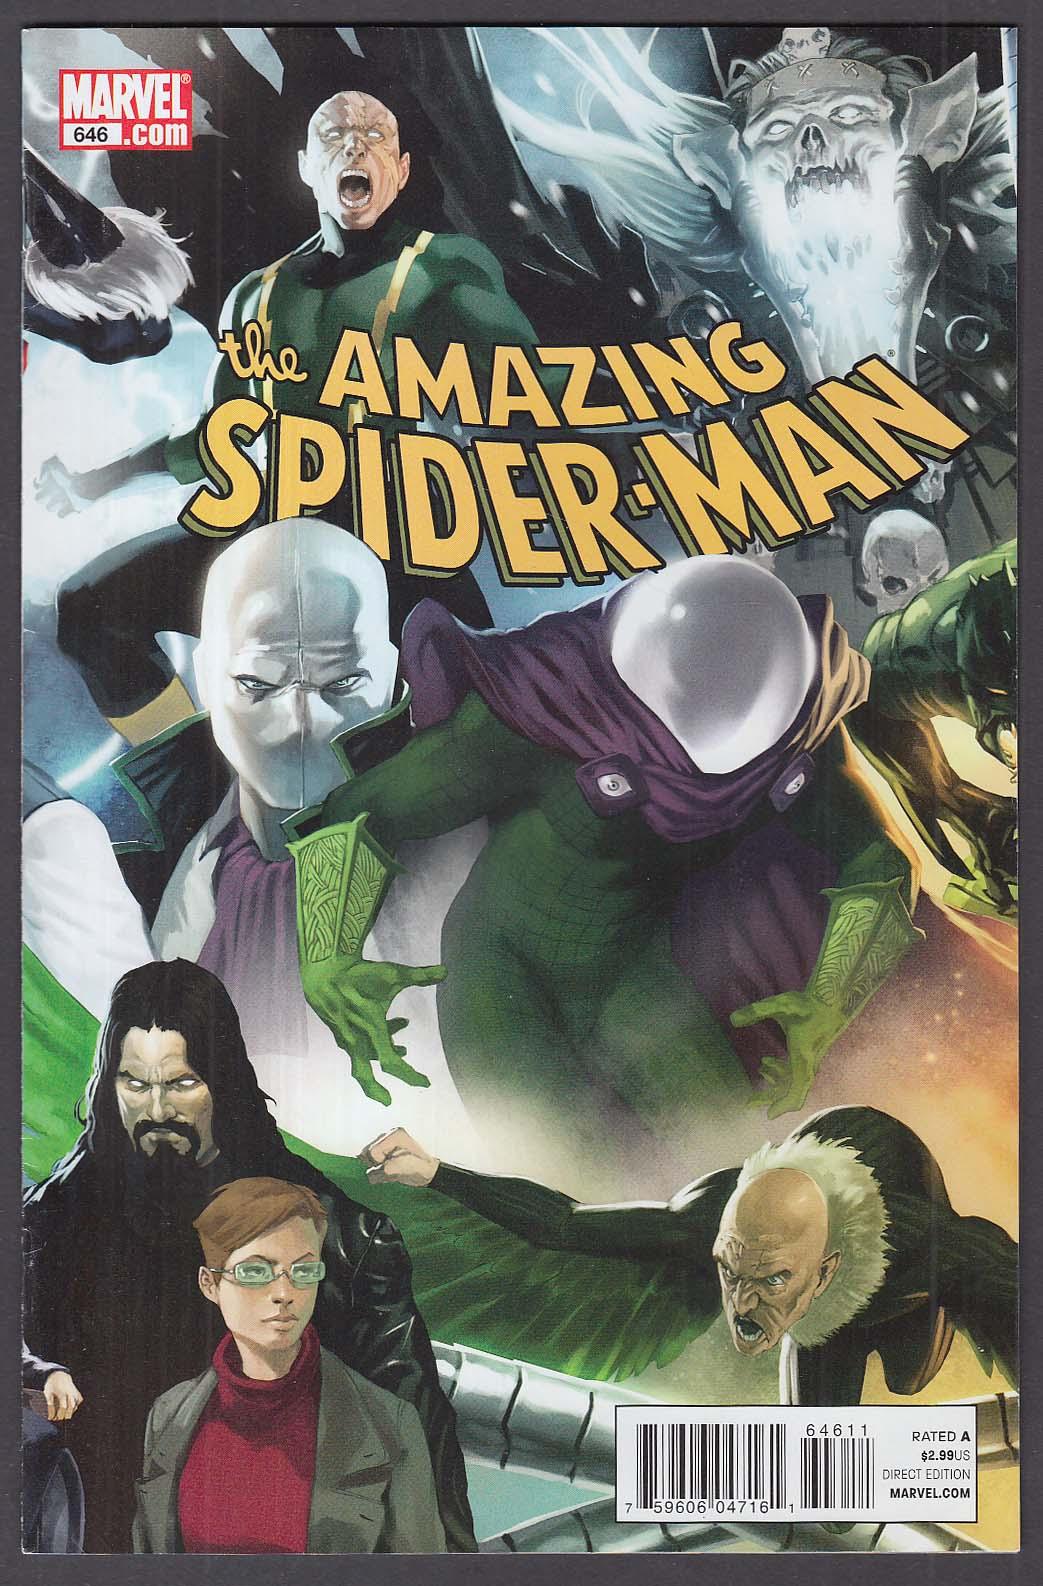 AMAZING SPIDER-MAN #646 Marvel comic book 12 2010